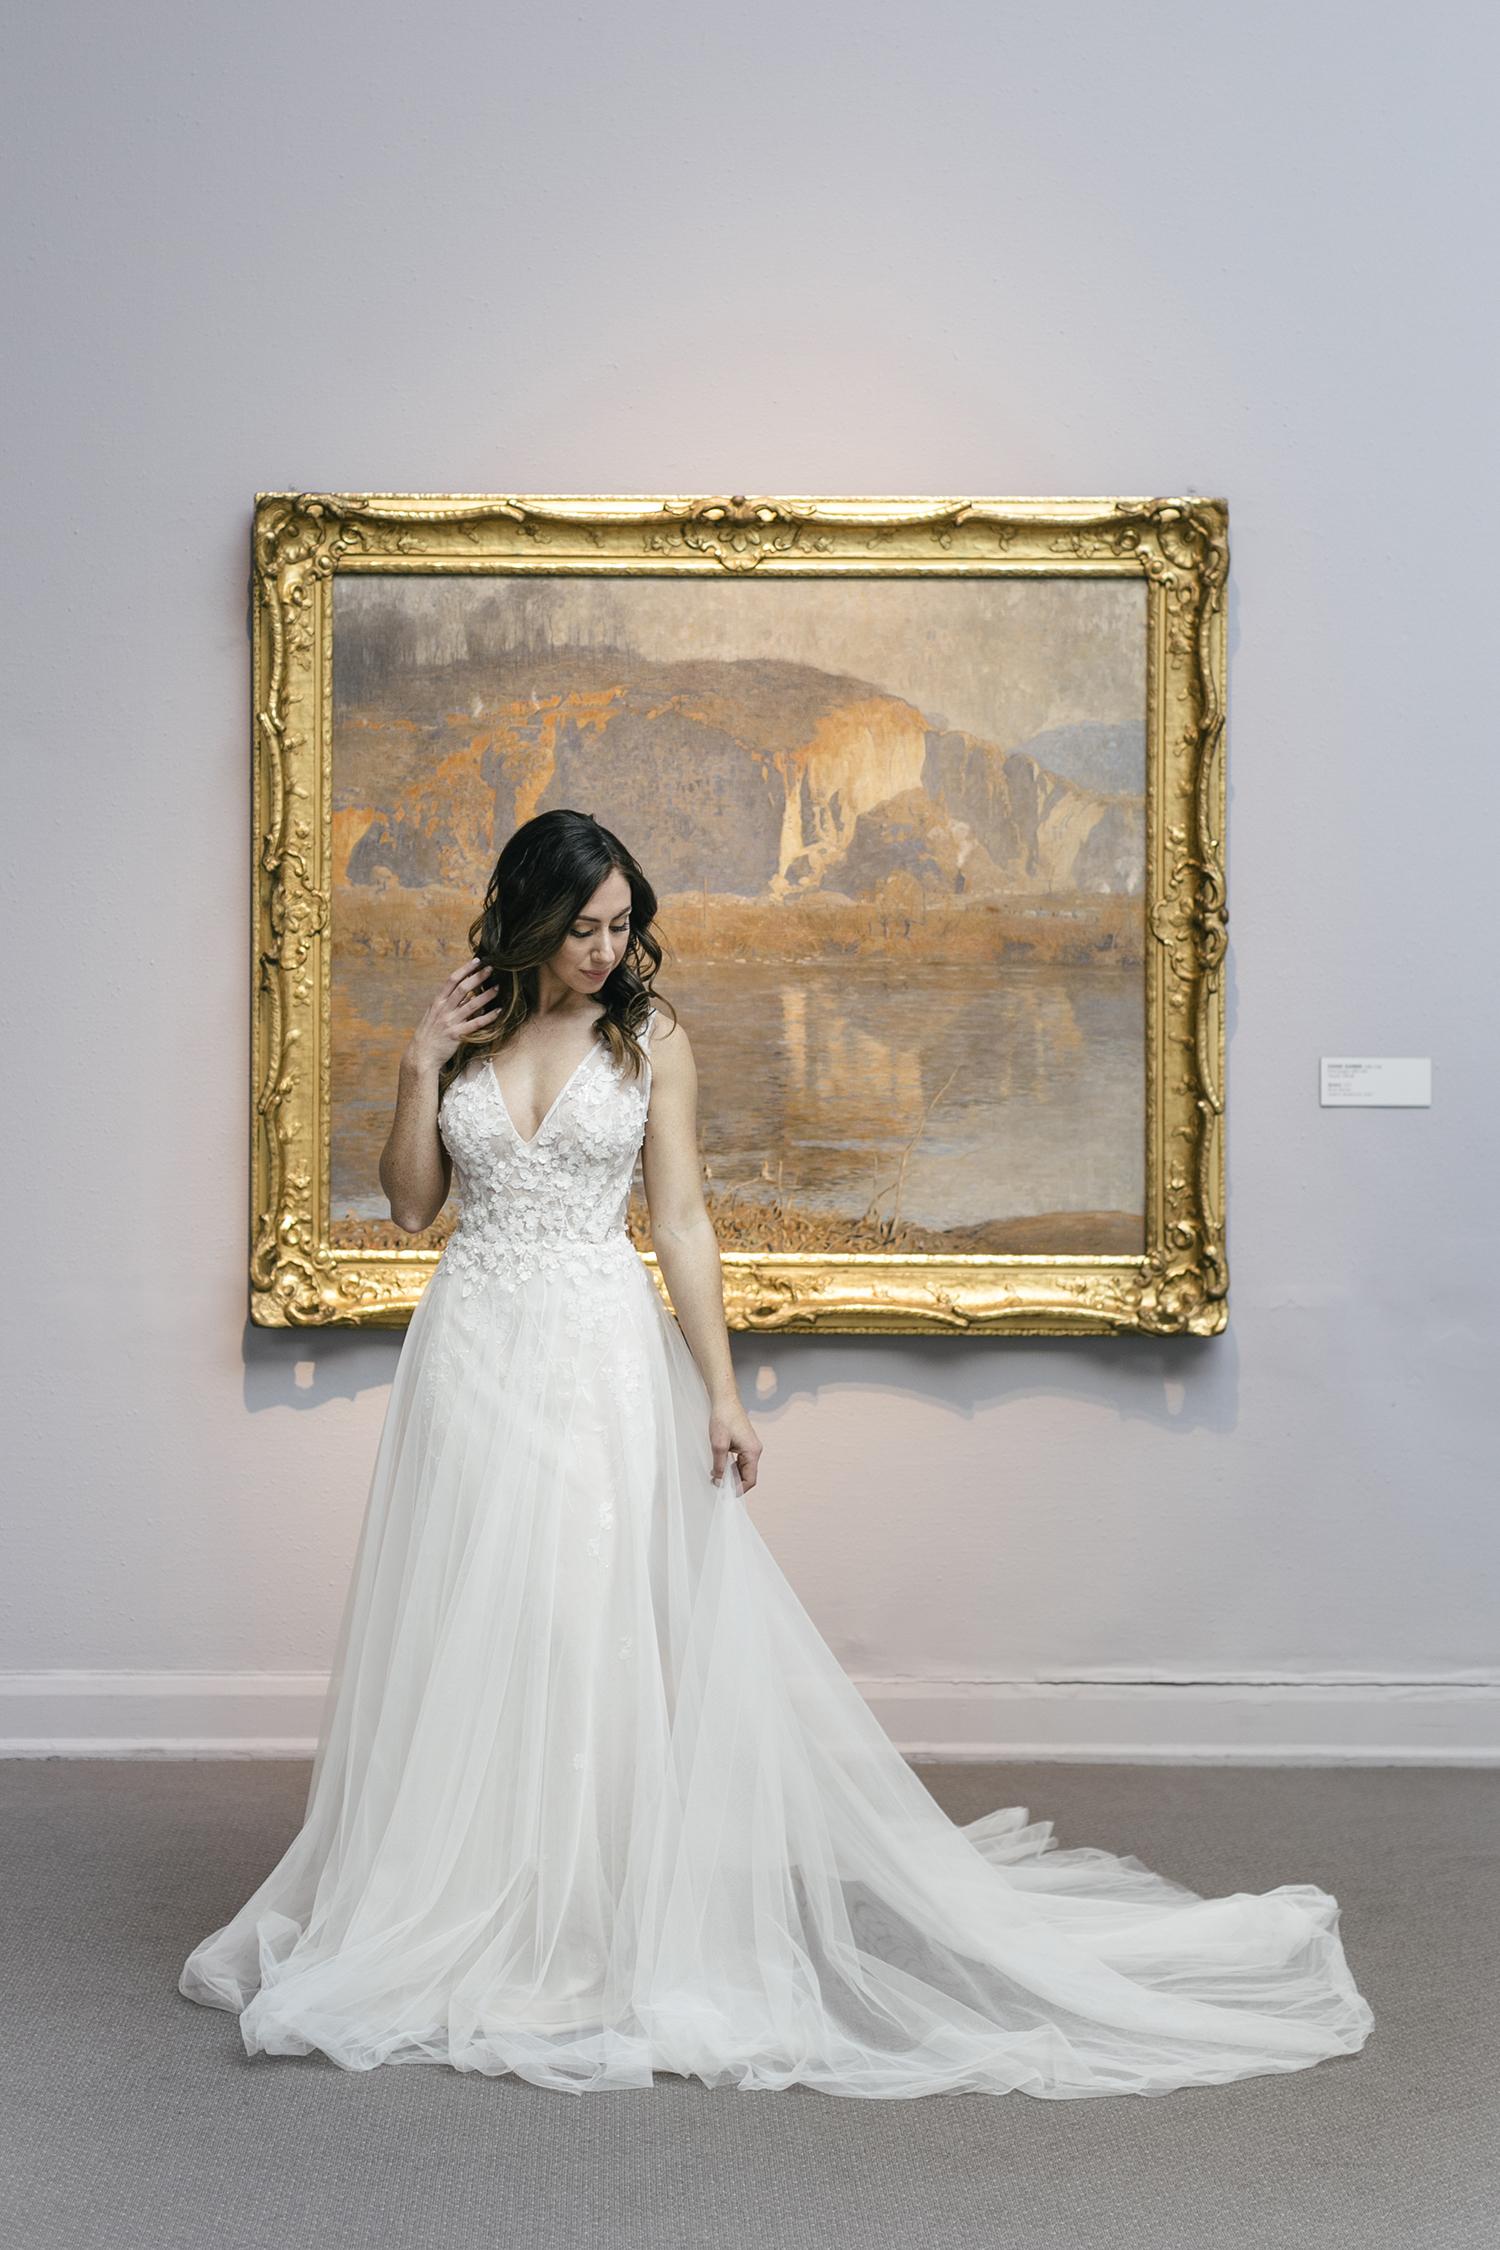 photography-wedding-weddings-natural-candid-pafa-pennsylvania academy-philadephia-philly-philadelphia wedding-mixed race-editorial-modern-fine-art-028.JPG